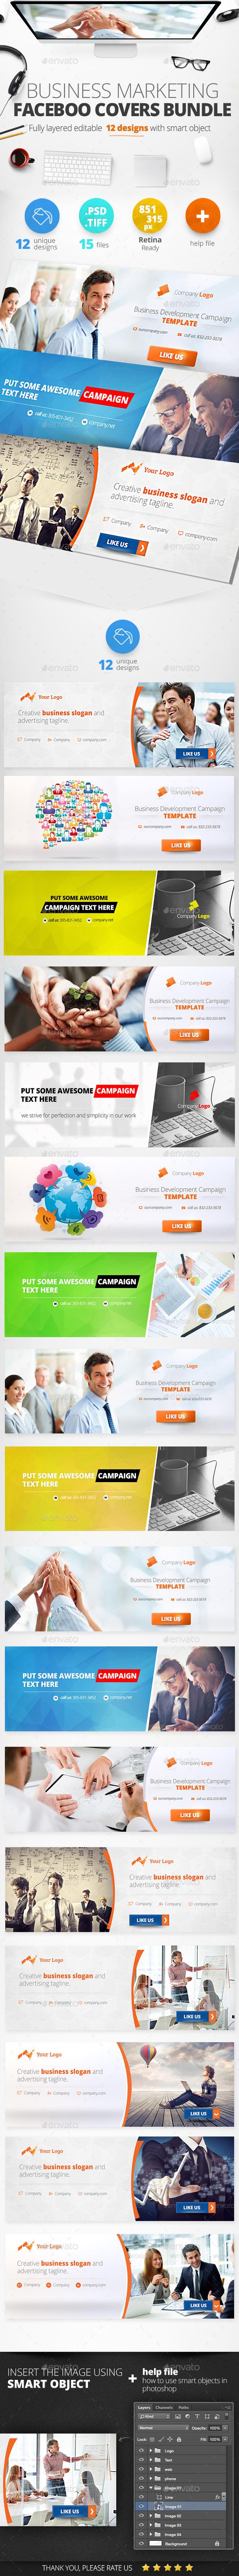 Corporate Facebook Covers Bundle 12 Designs